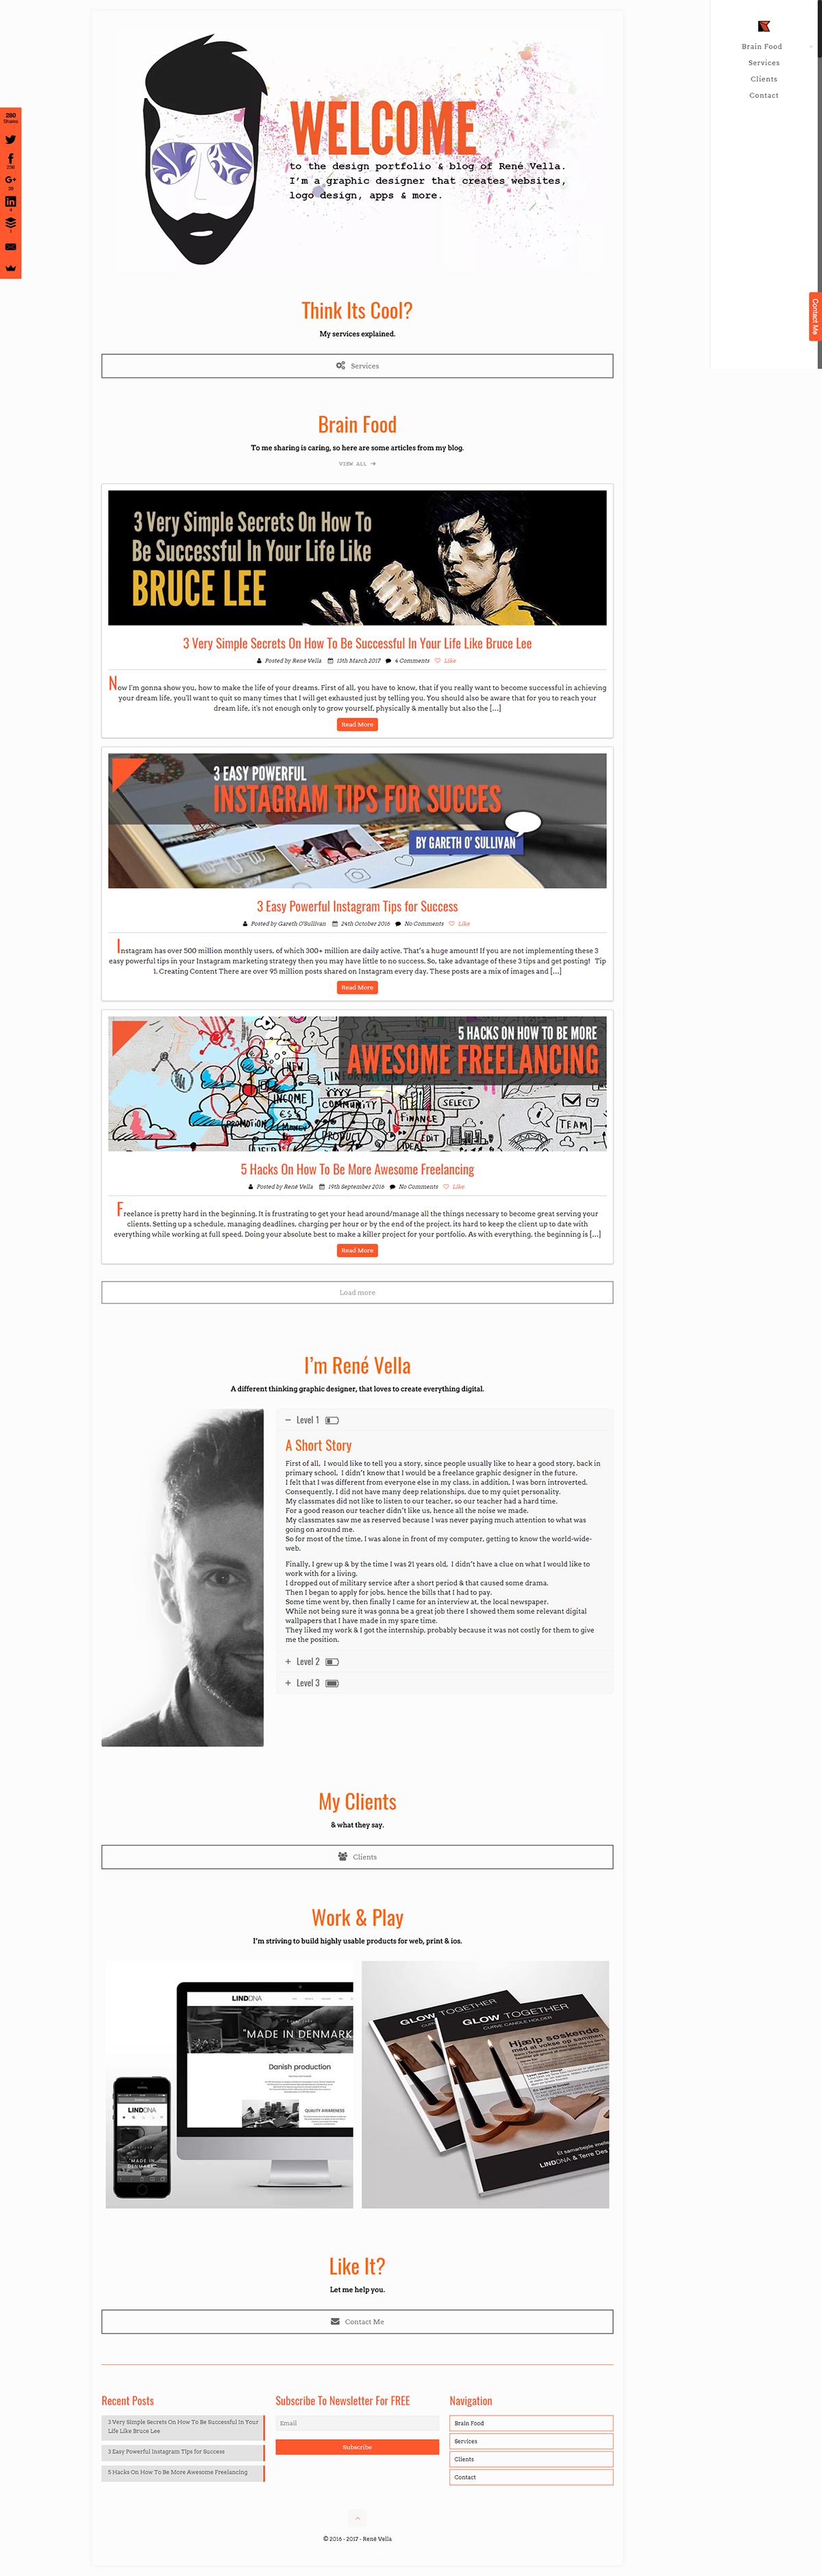 Web Design  Web designer graphic Graphic Designer one page design portfolio Blog